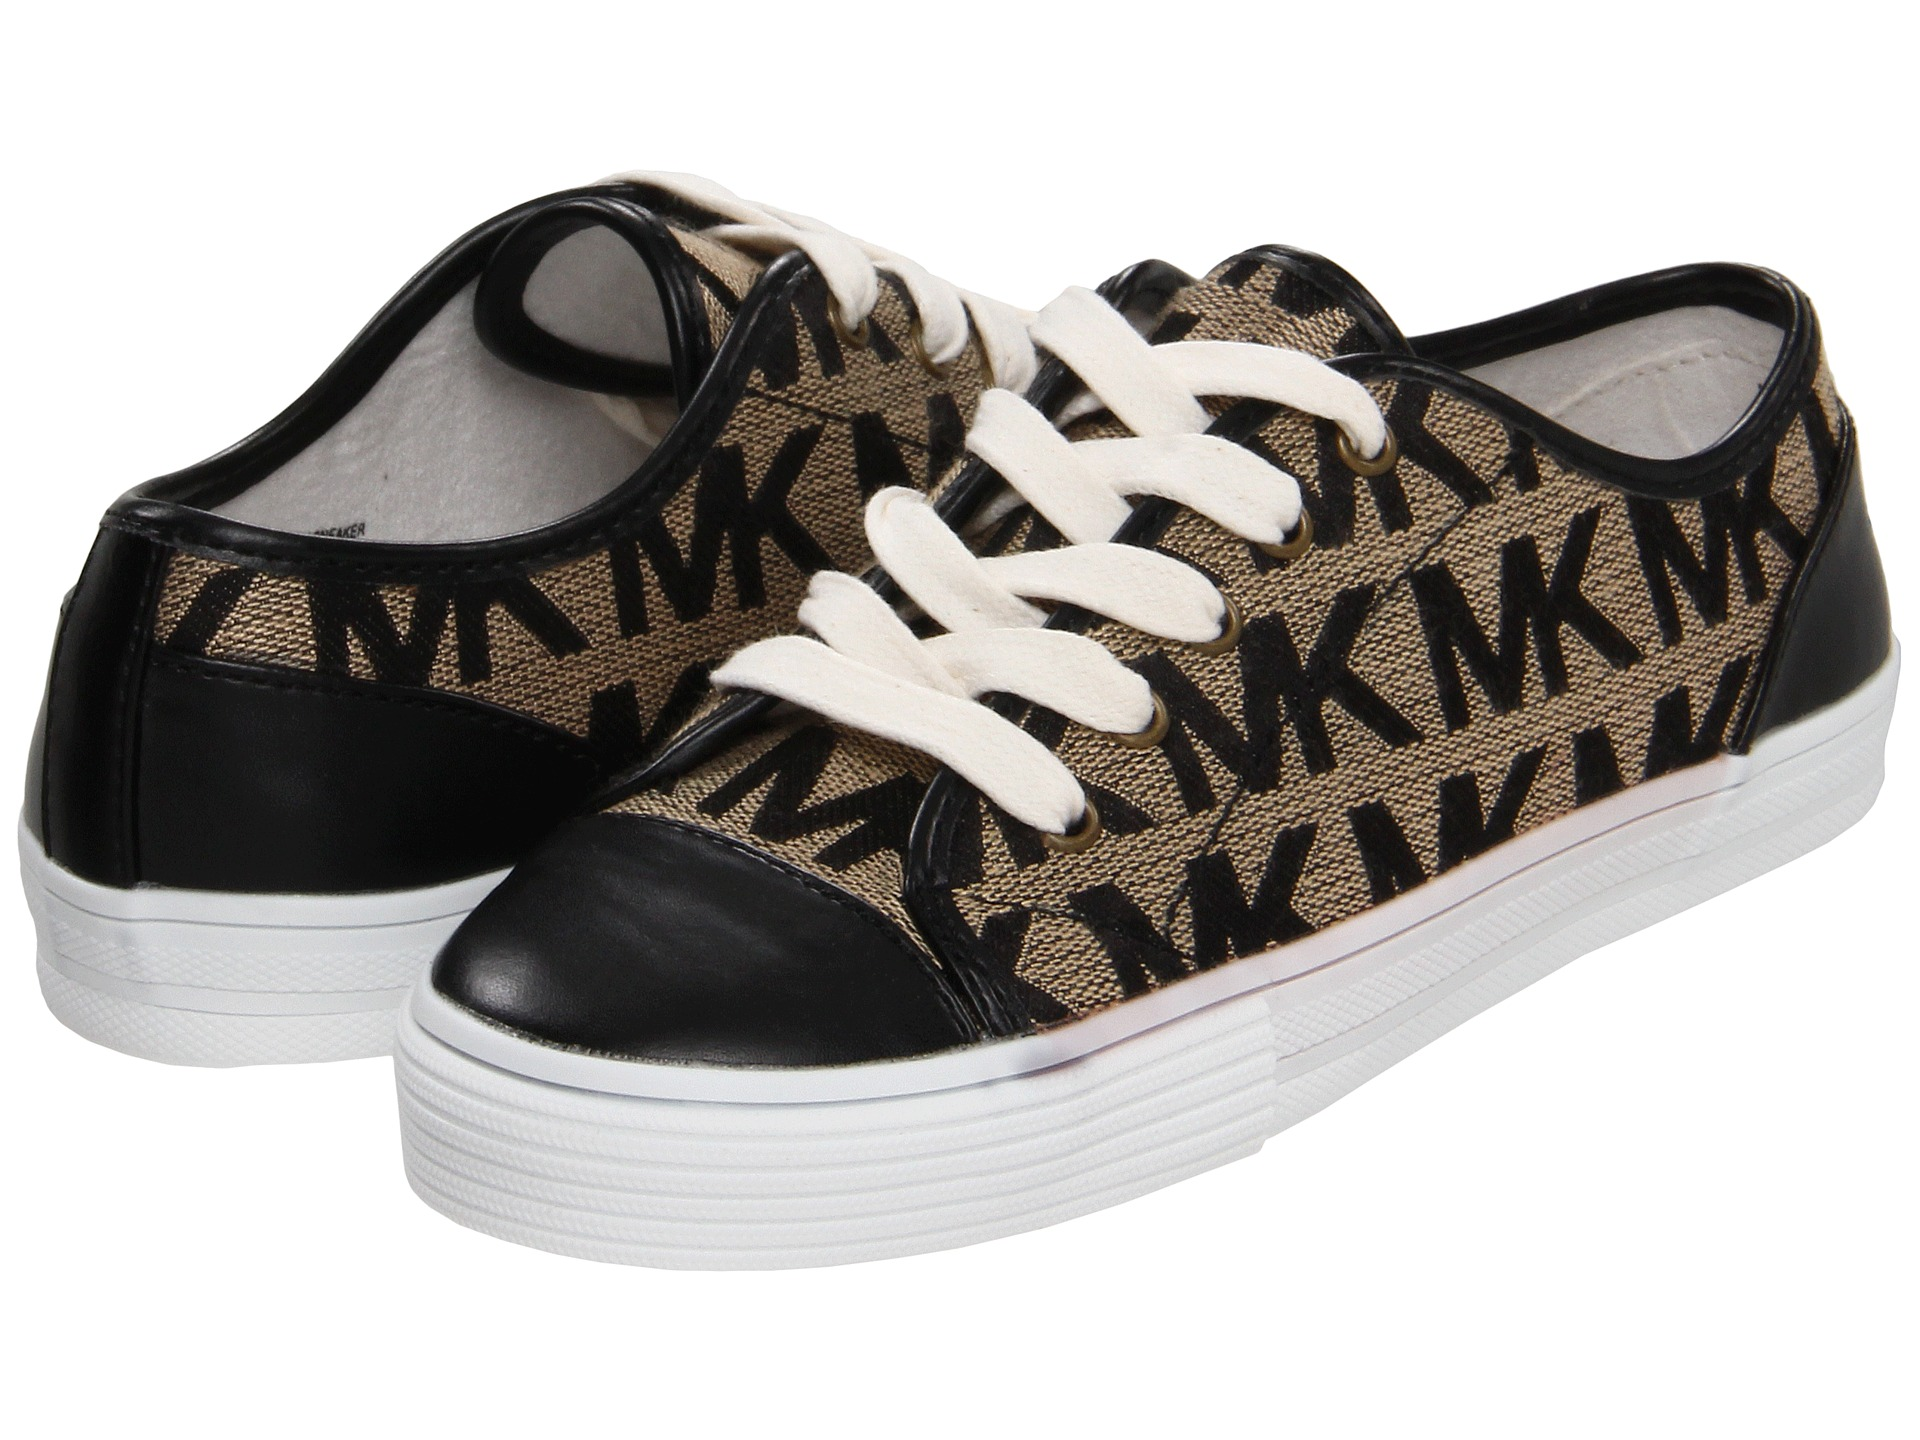 Kids Shoes Michael Kors